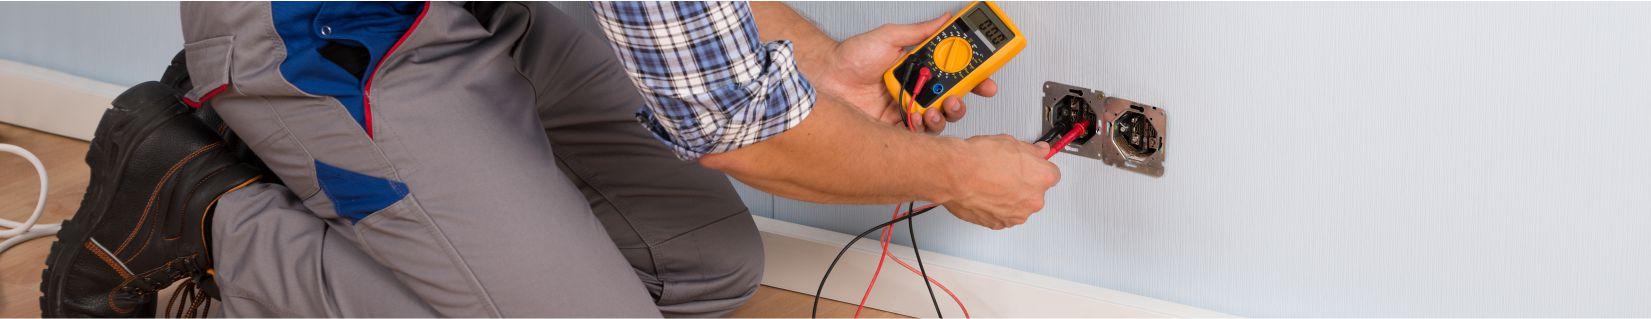 Electrician Testing a Wall Plug